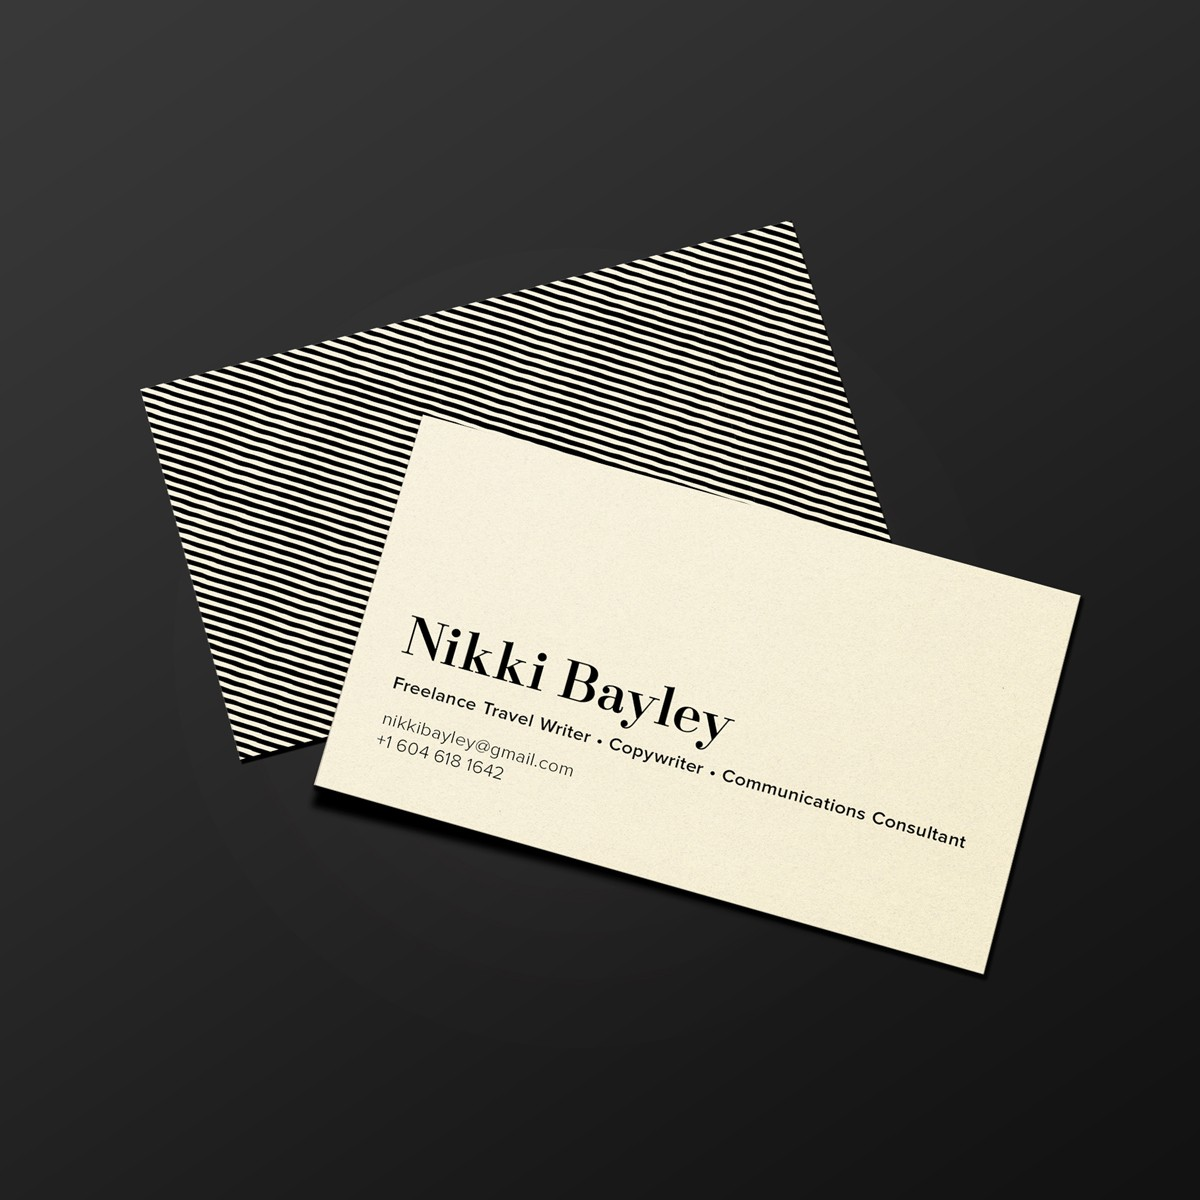 Miscellaneous Business Card Designs - Pulp & Pixel